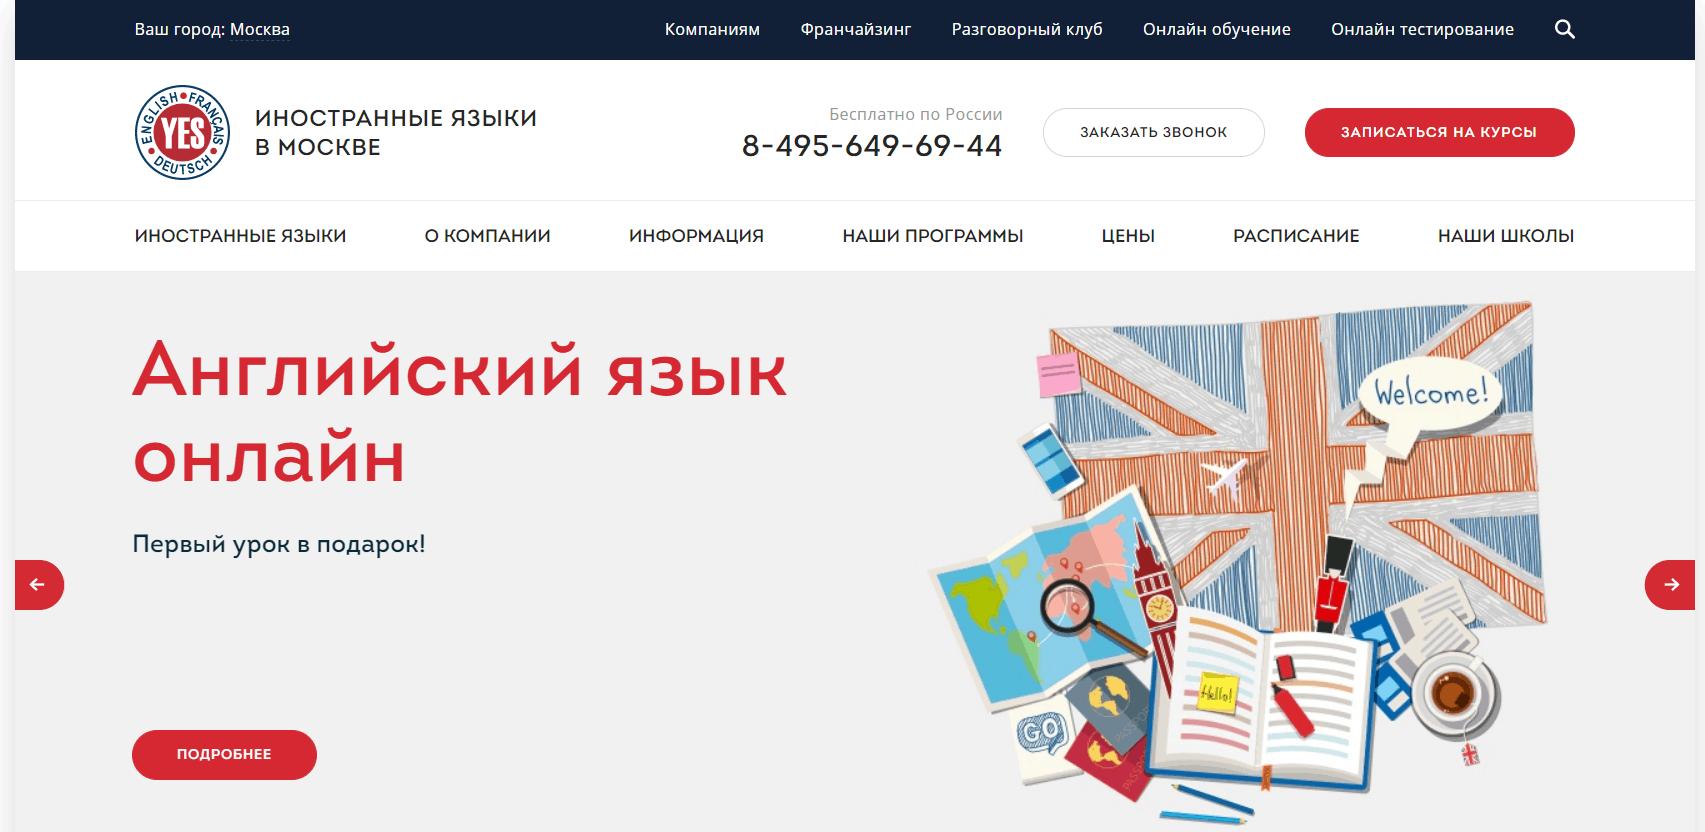 Центр иностранных языков «YES»